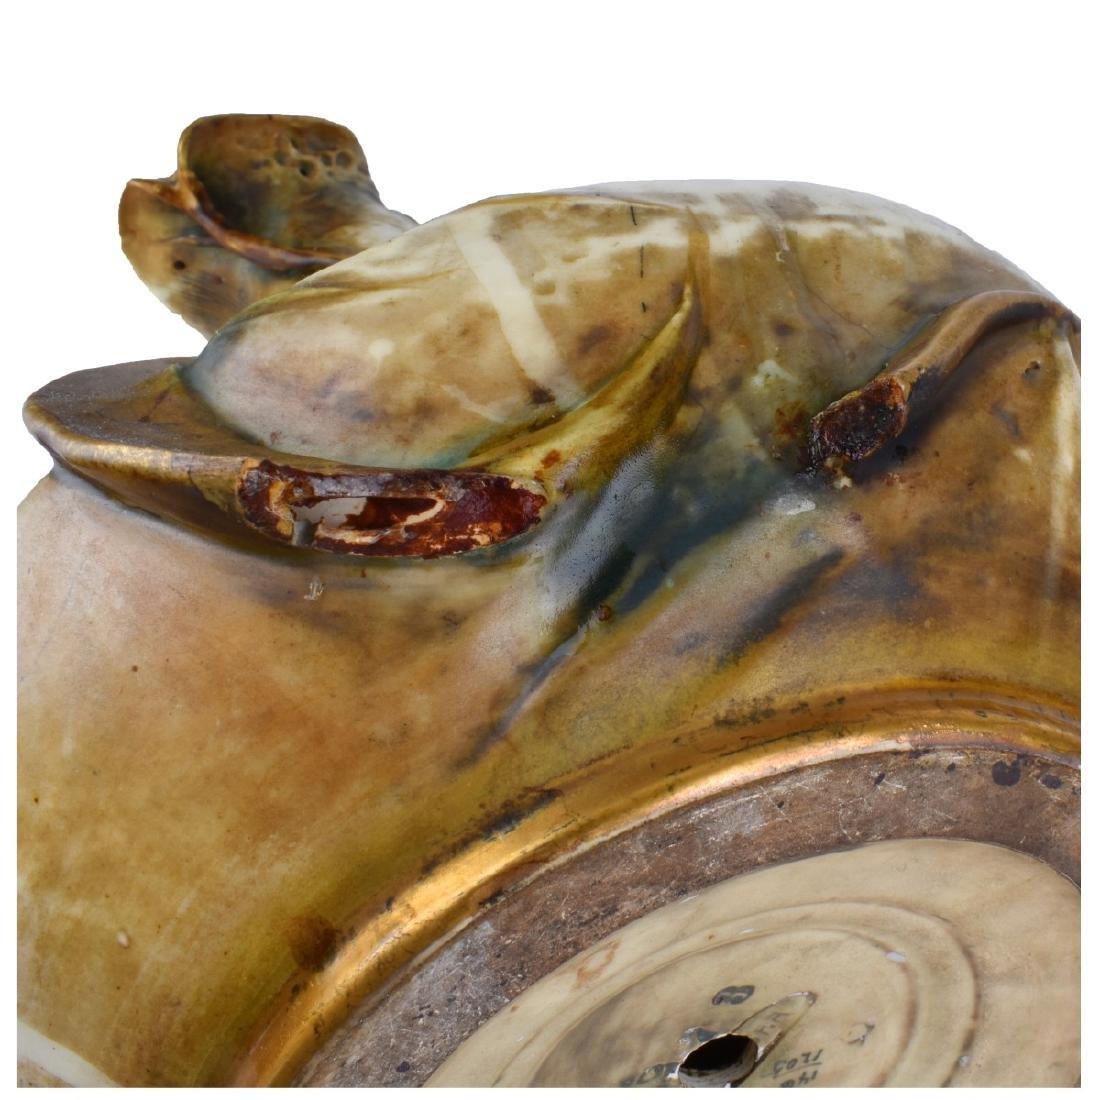 Large Werke Reissner Amphora Vase - 5